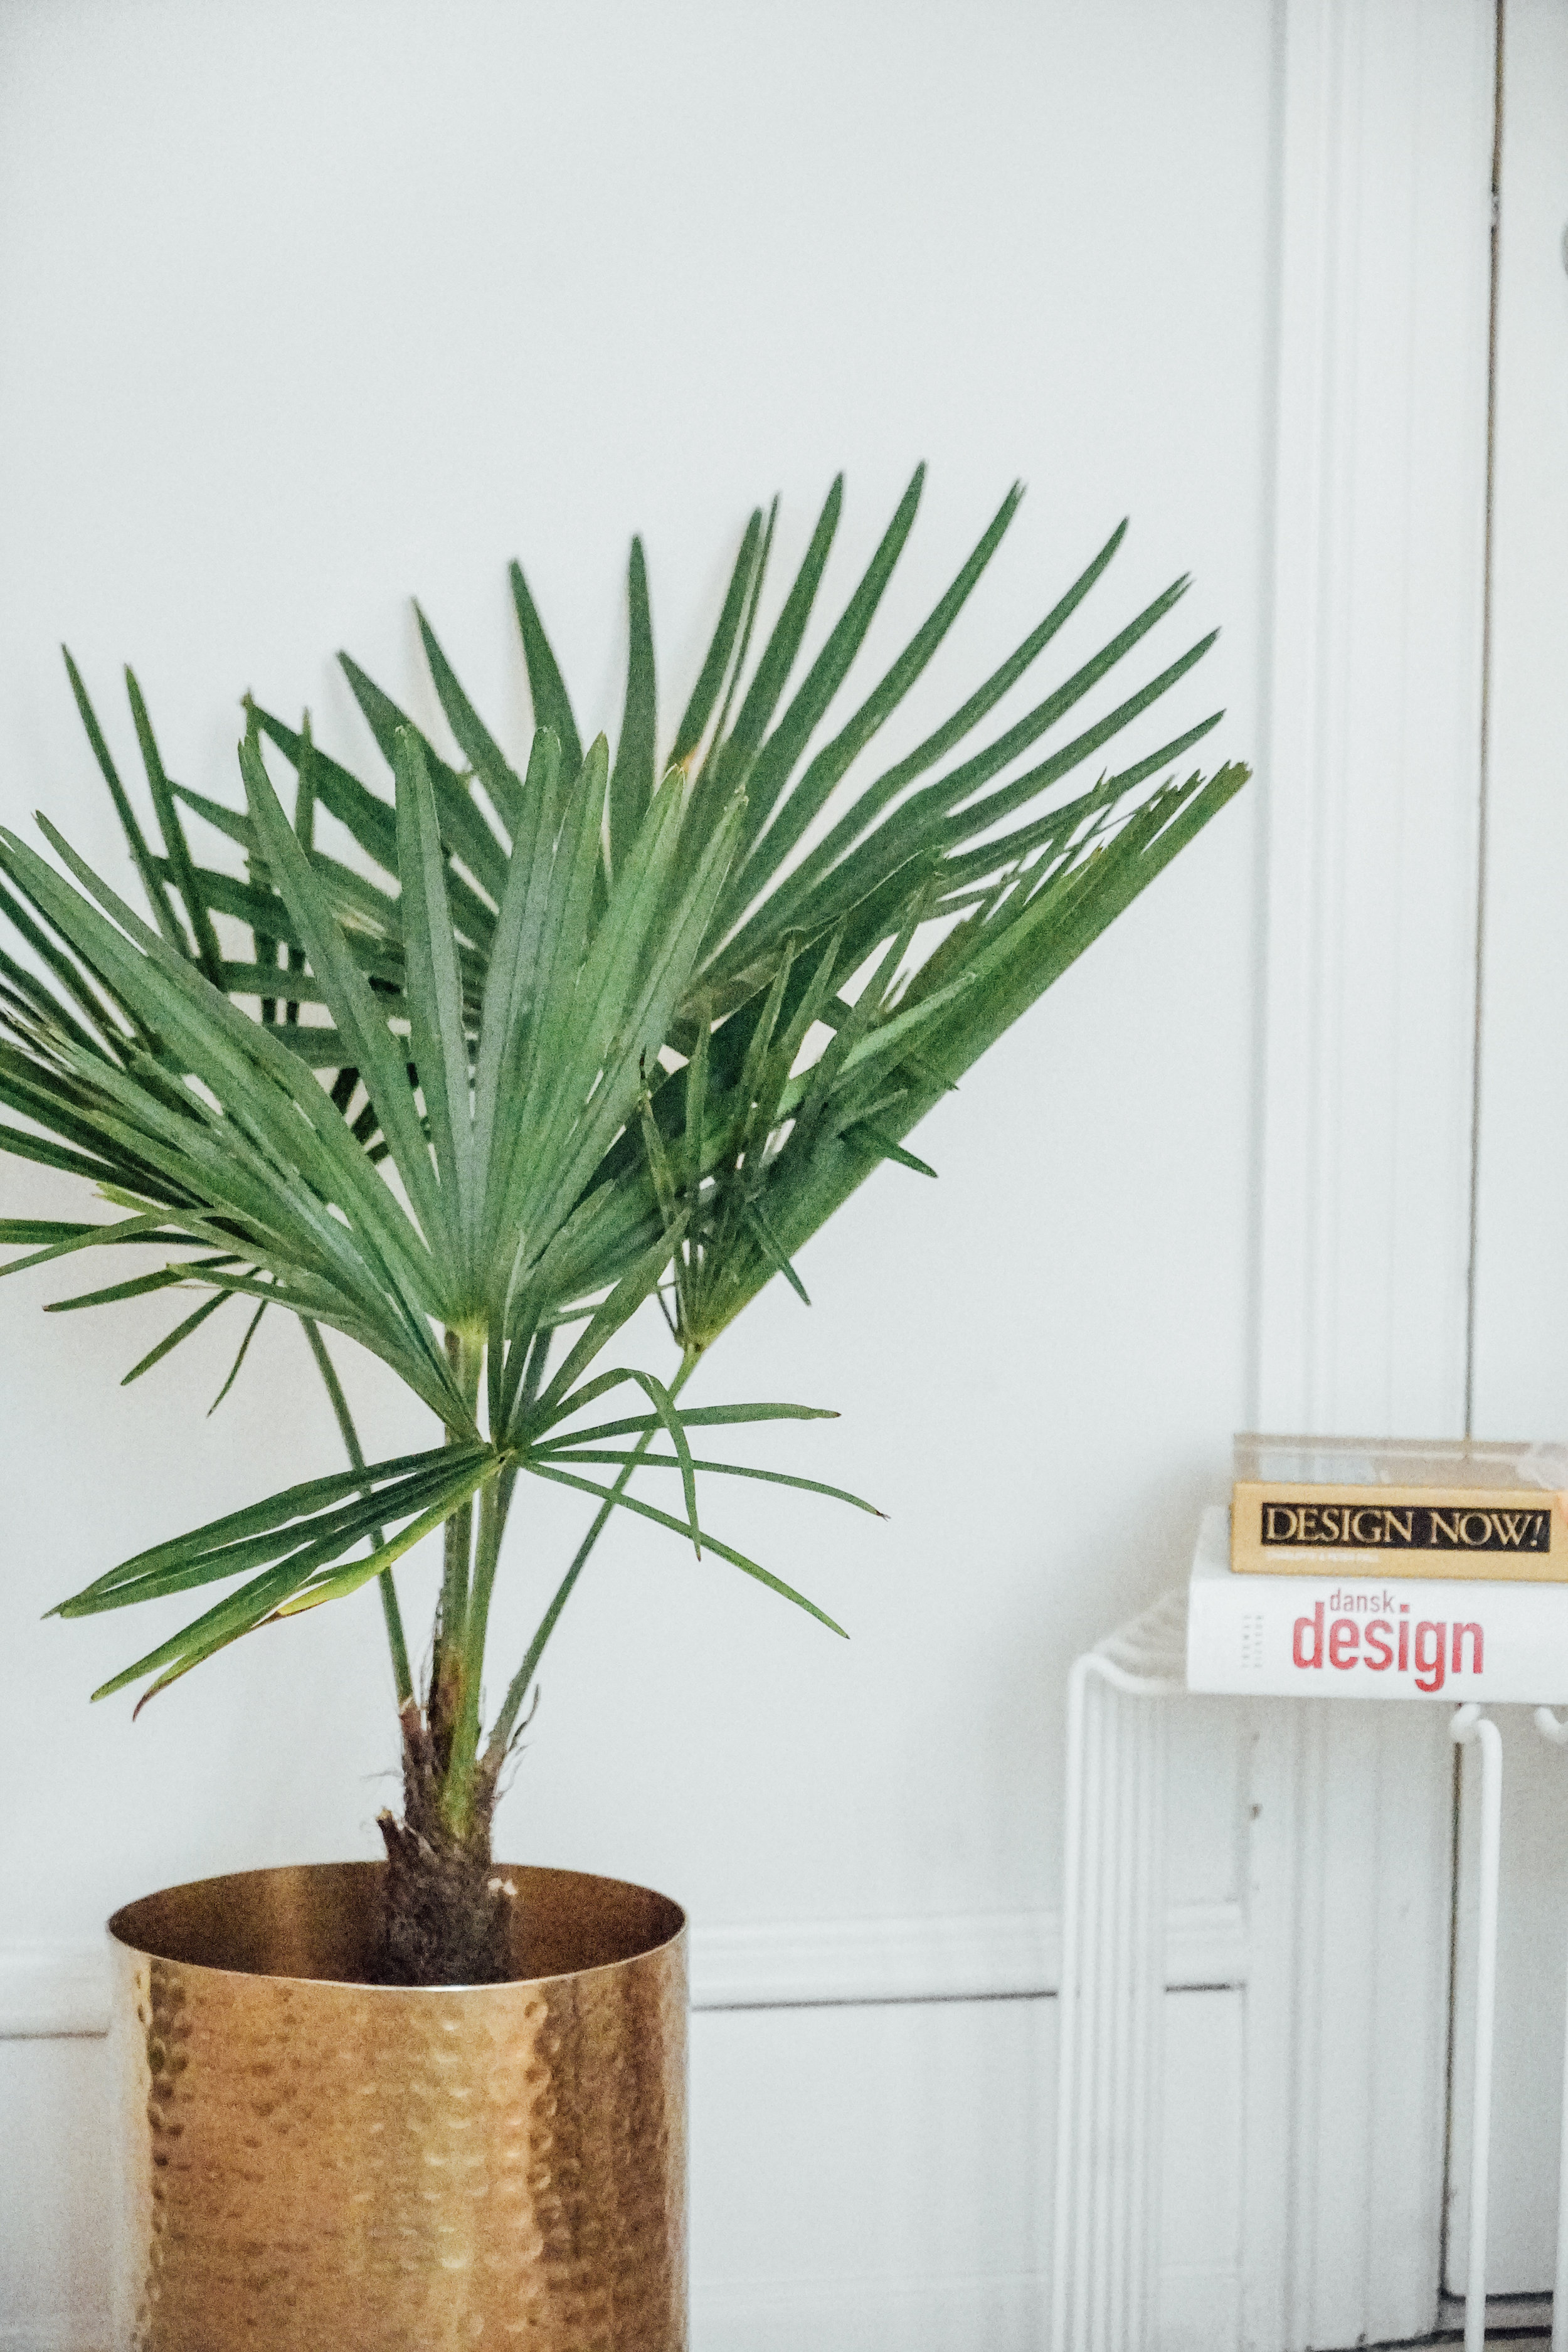 Plants at Alexandra Raben studio